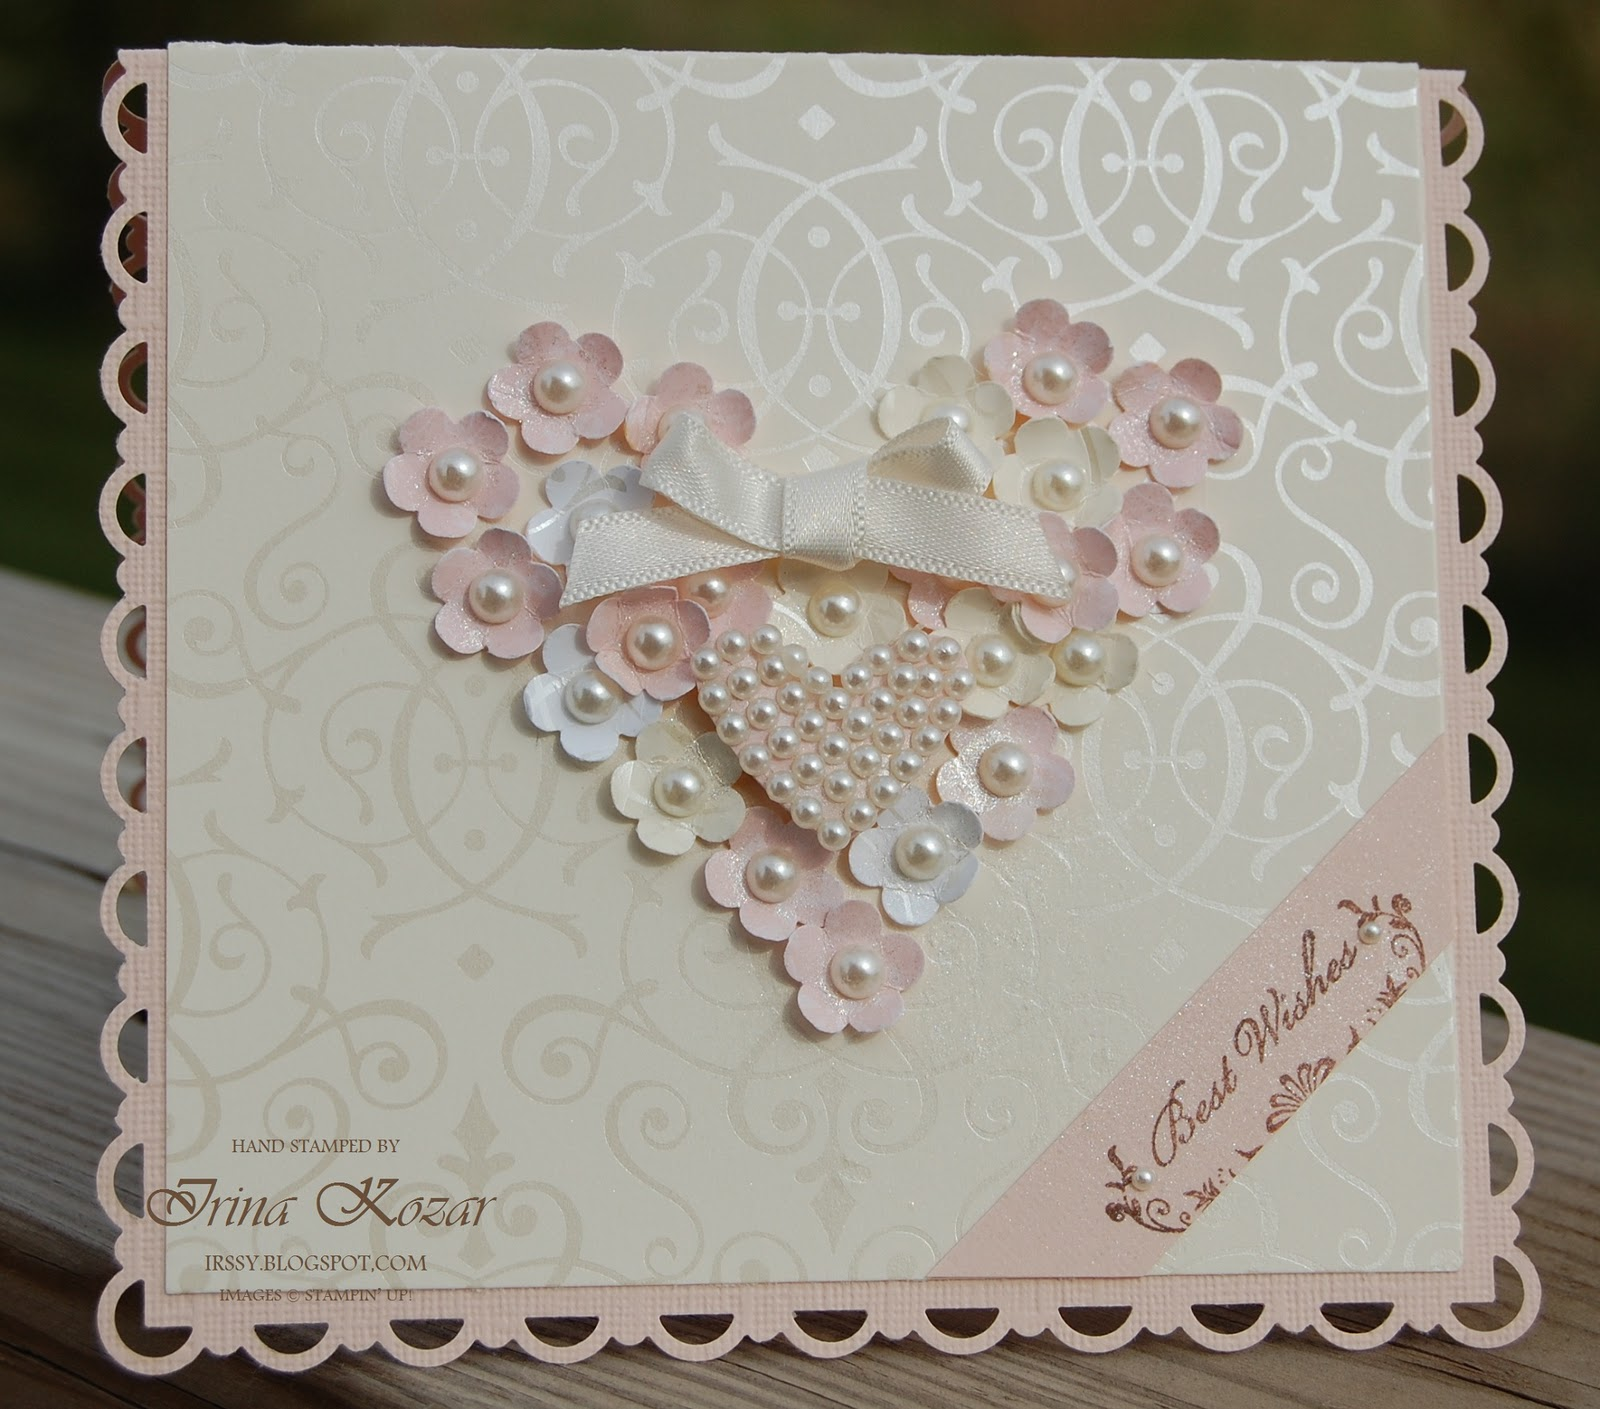 13 Homemade Wedding Cards Design Images Handmade Wedding